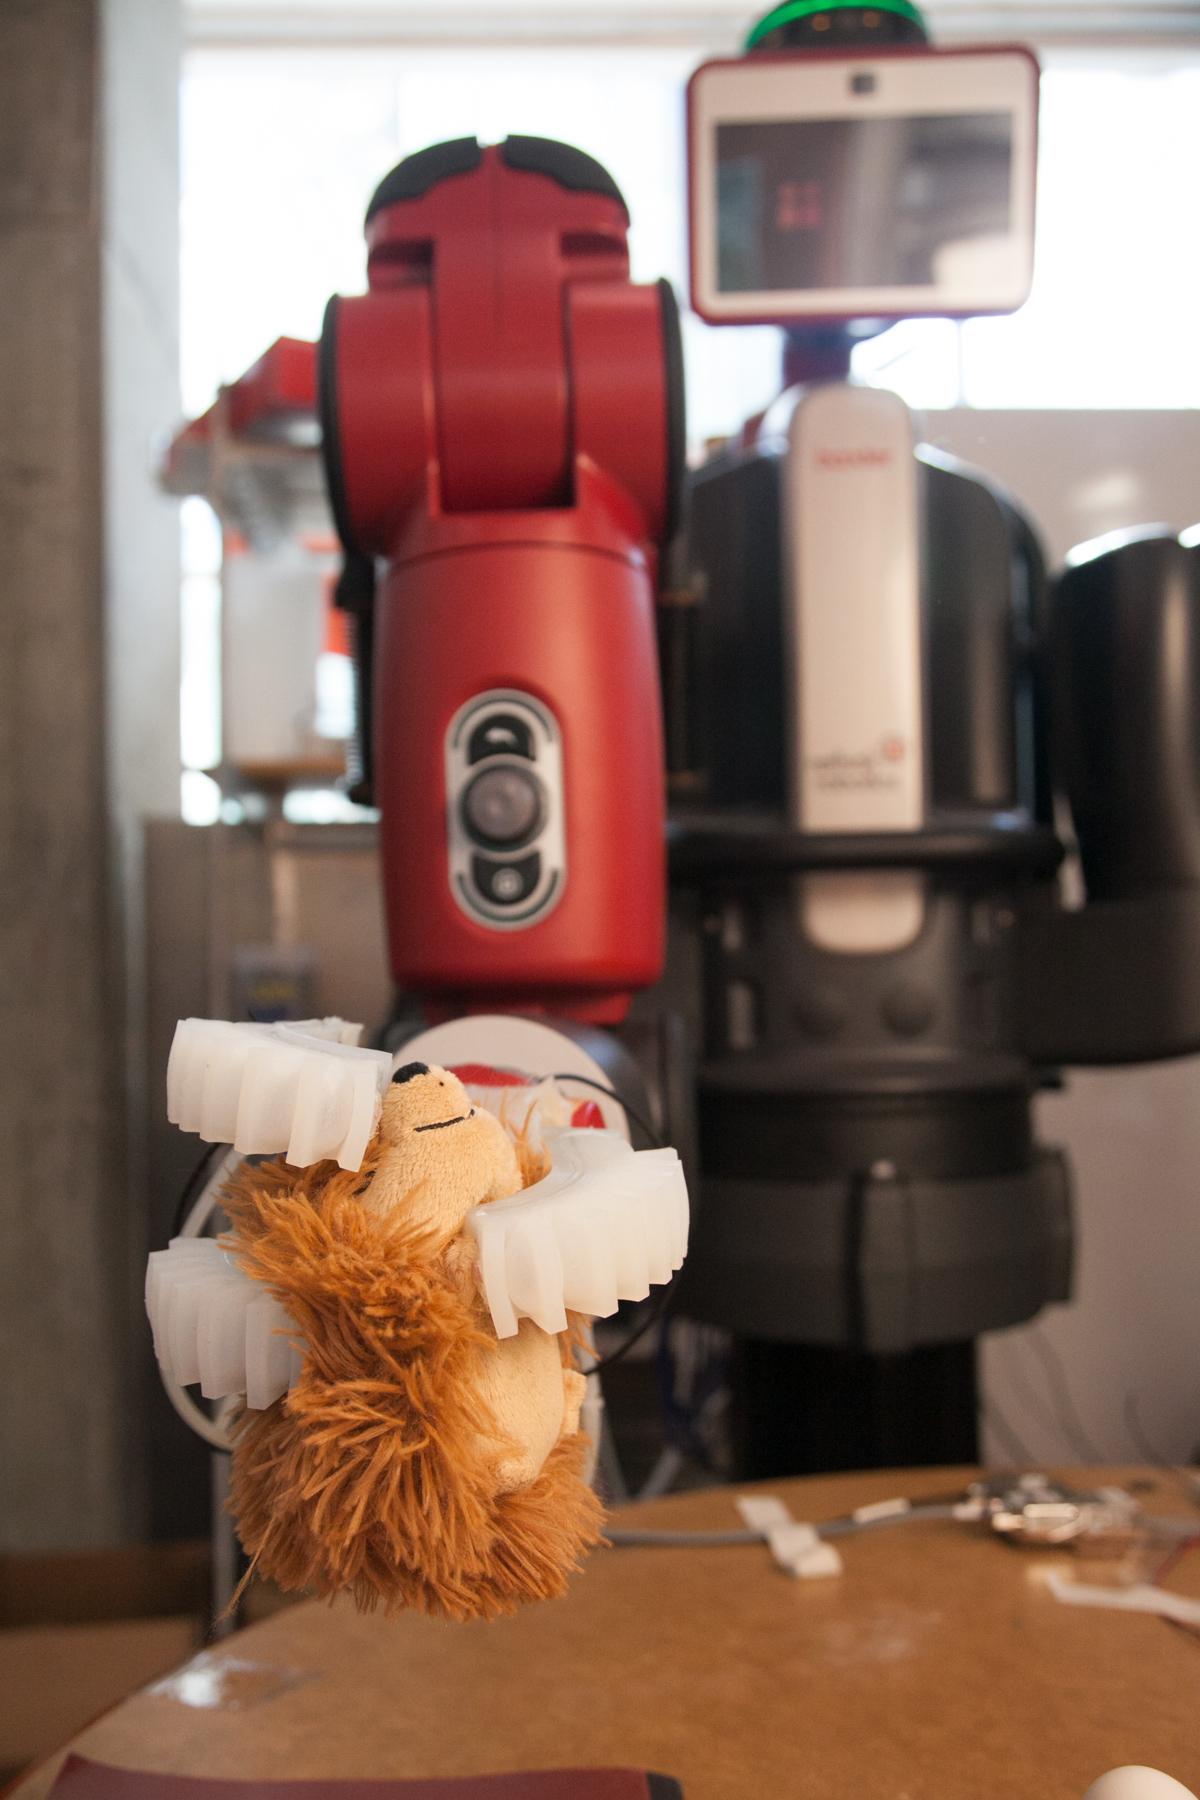 MIT robotic hand picks up Beanie Baby